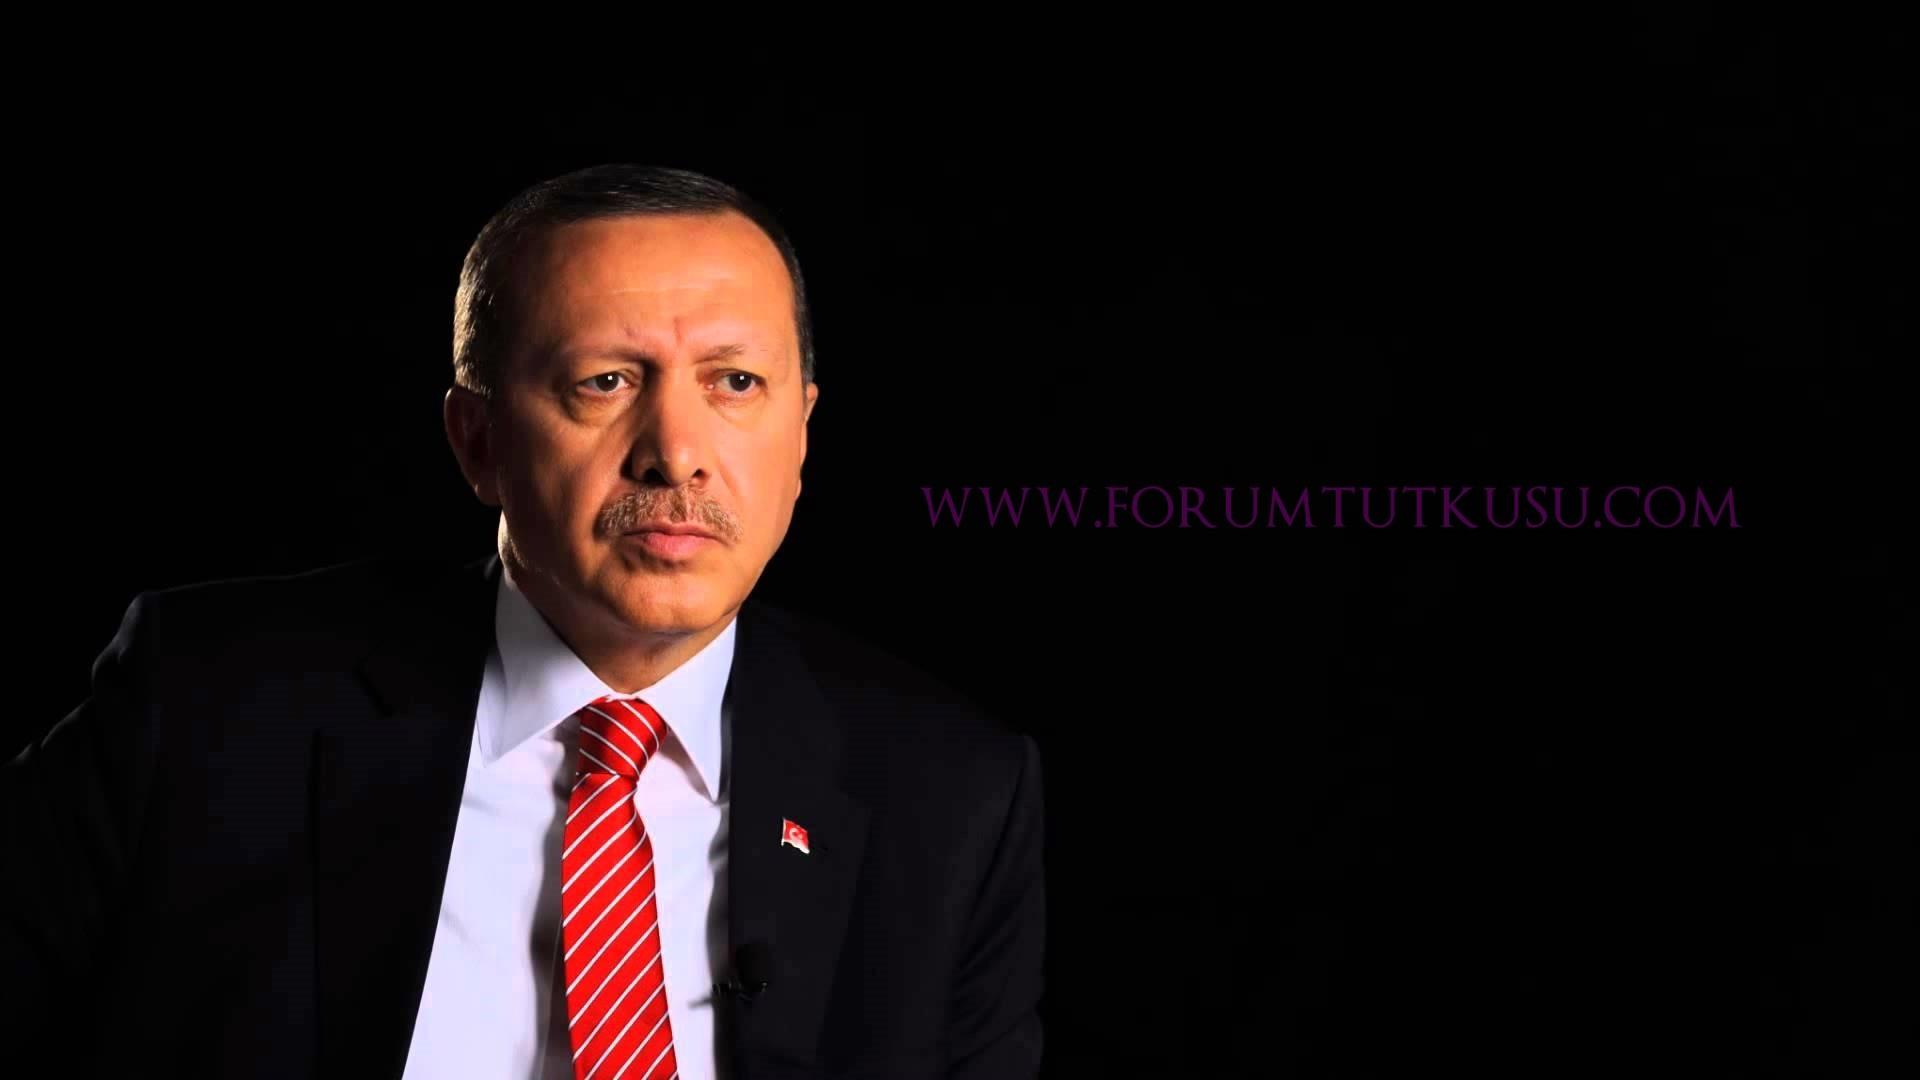 Recep Tayyip Erdoğan Wallpaper Recep Tayyip Erdoğan